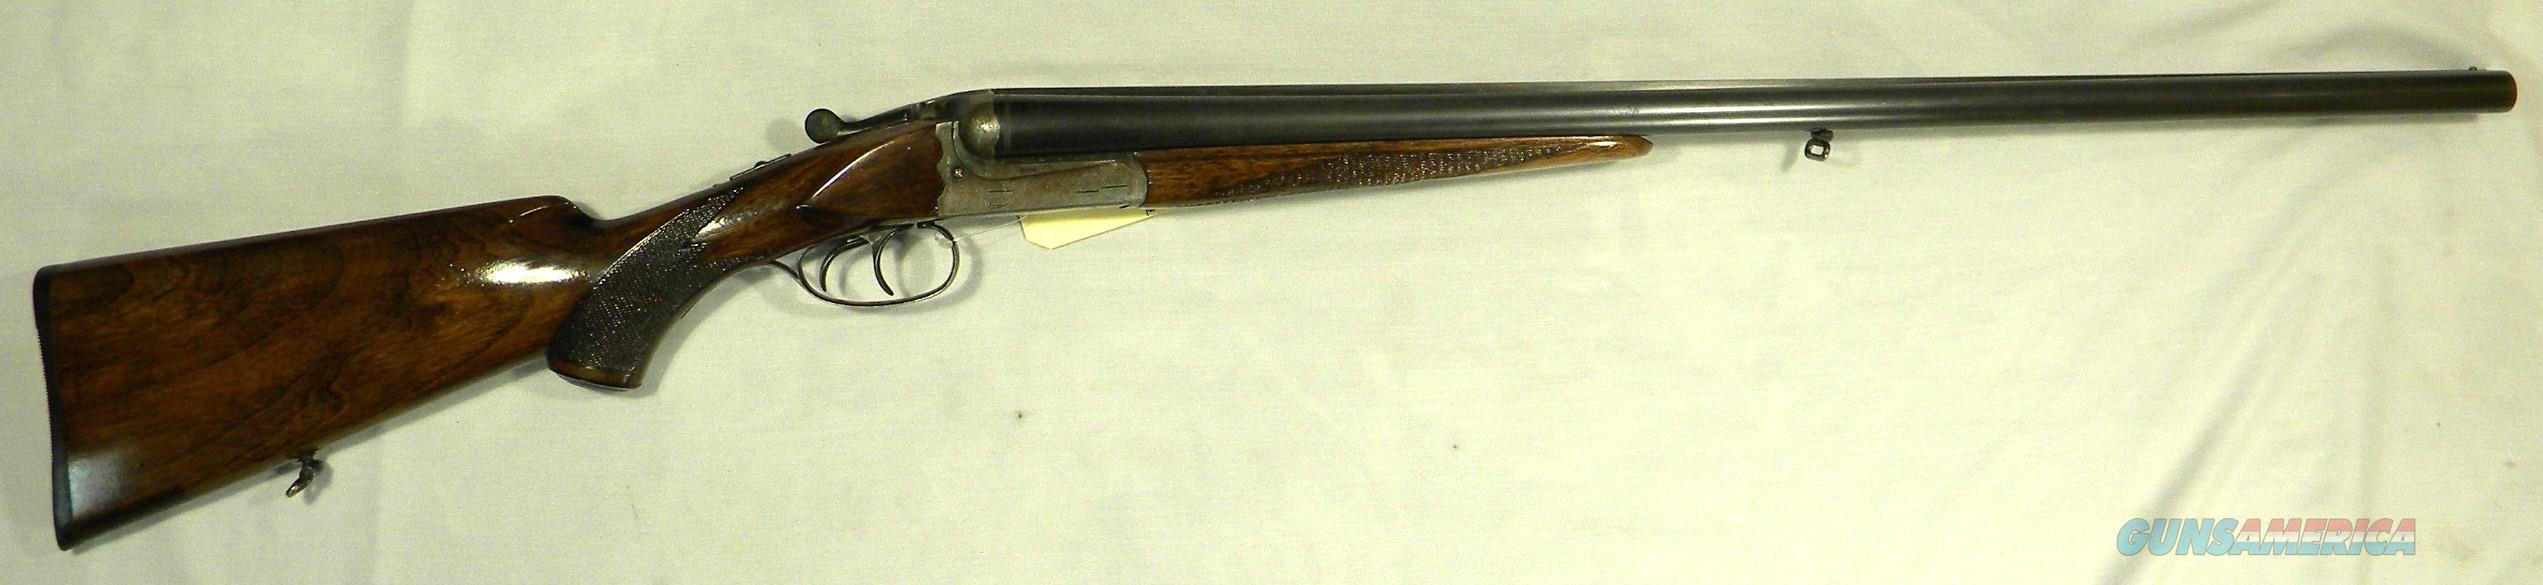 German 12 Gauge Side-By-Side Shotgun, Custom Built  Guns > Shotguns > G Misc Shotguns